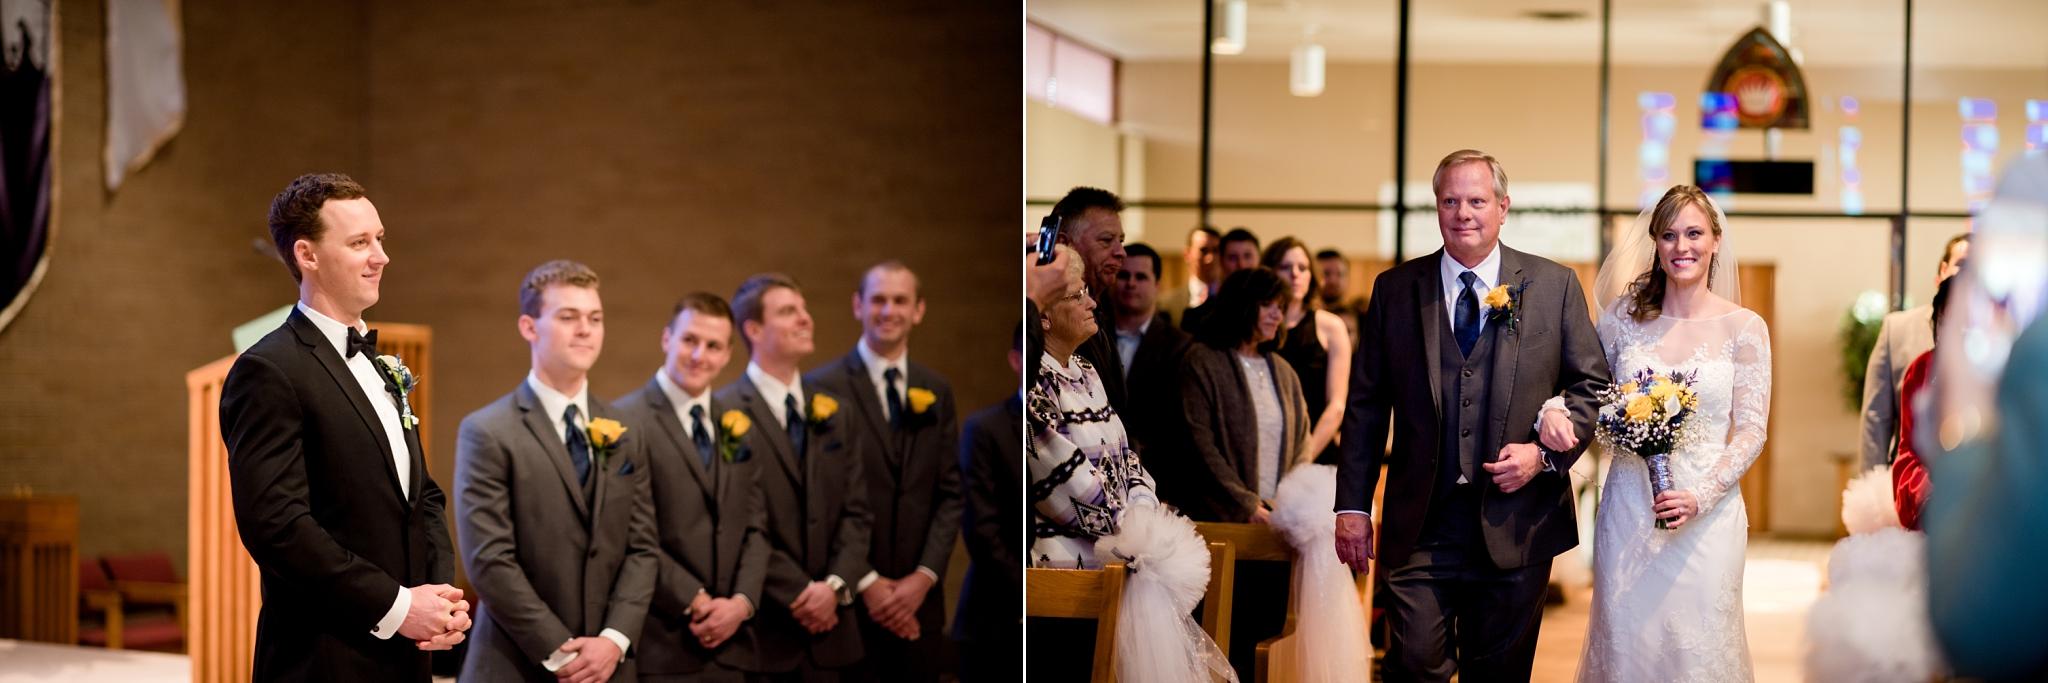 Chateaux at Fox Meadows Wedding_0017.jpg